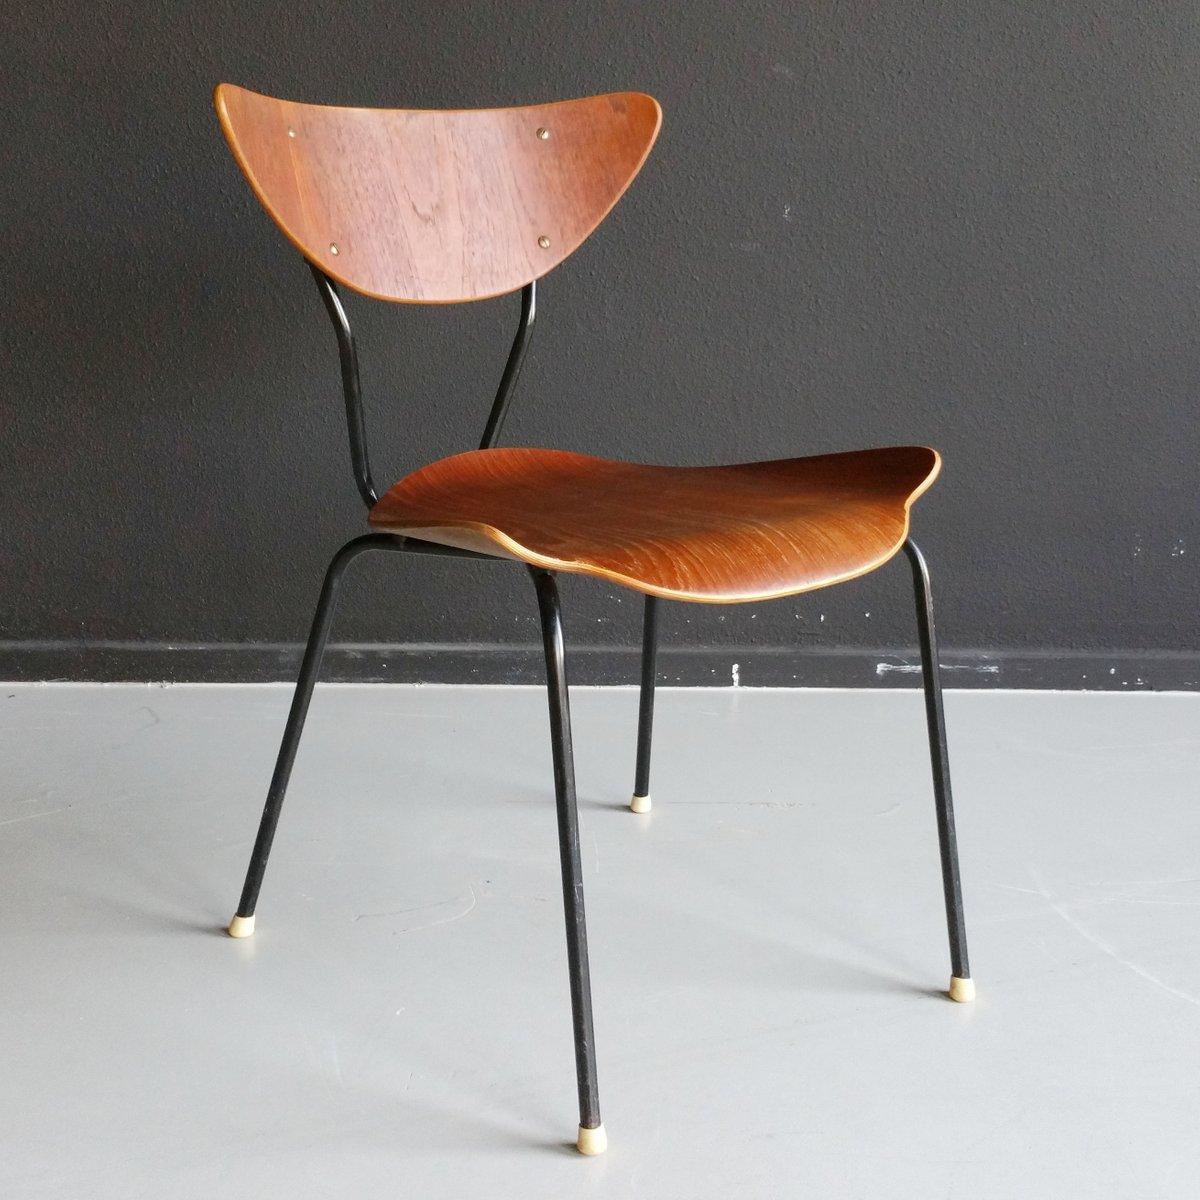 mid century stuhl aus teak schichtholz 1950er bei pamono. Black Bedroom Furniture Sets. Home Design Ideas